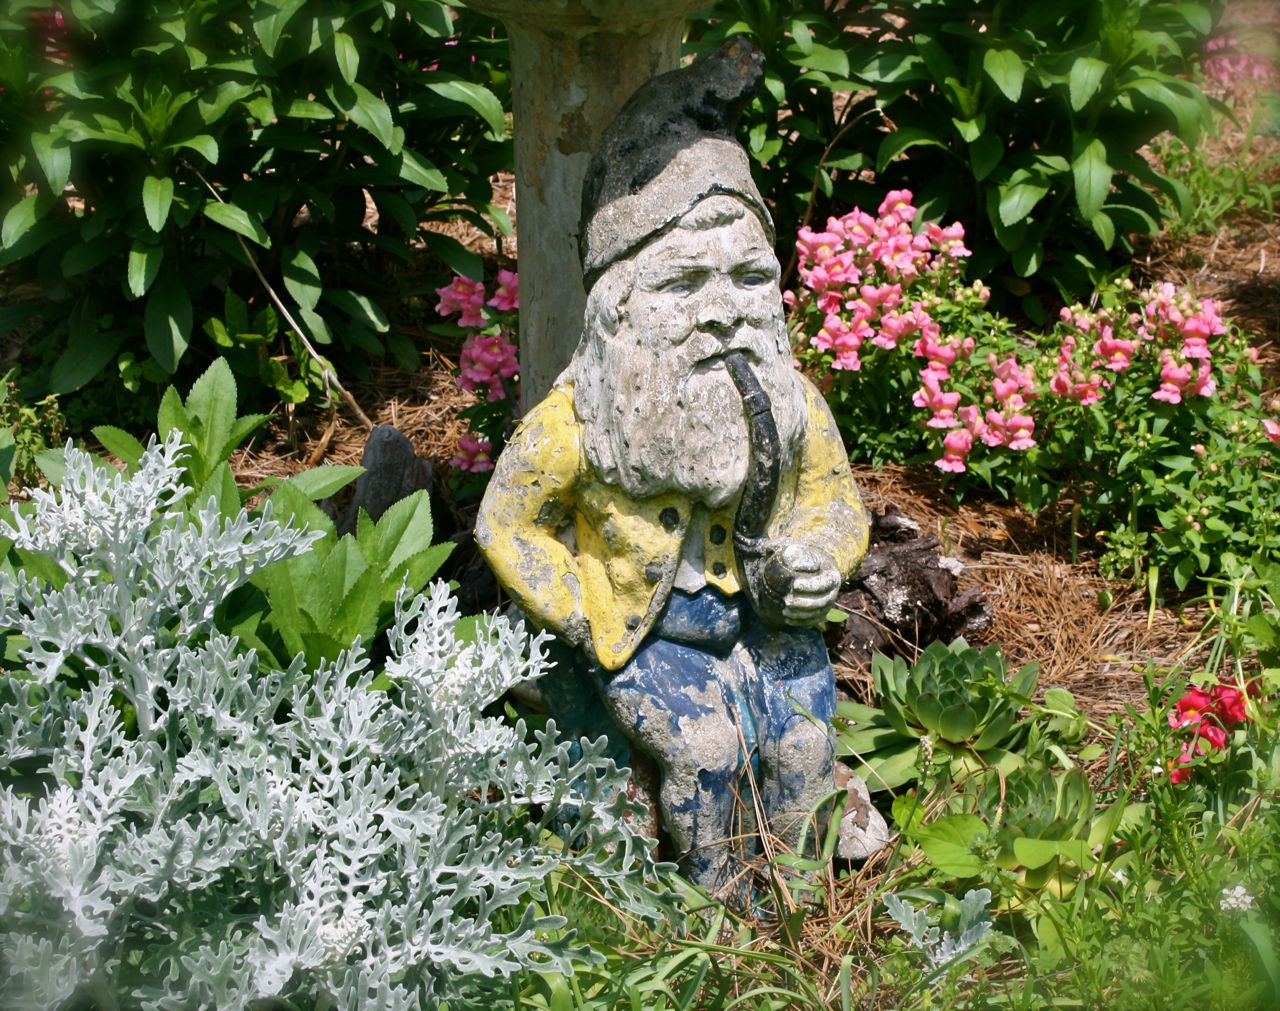 Gnome In Garden: Breaking New Ground In Zone 6